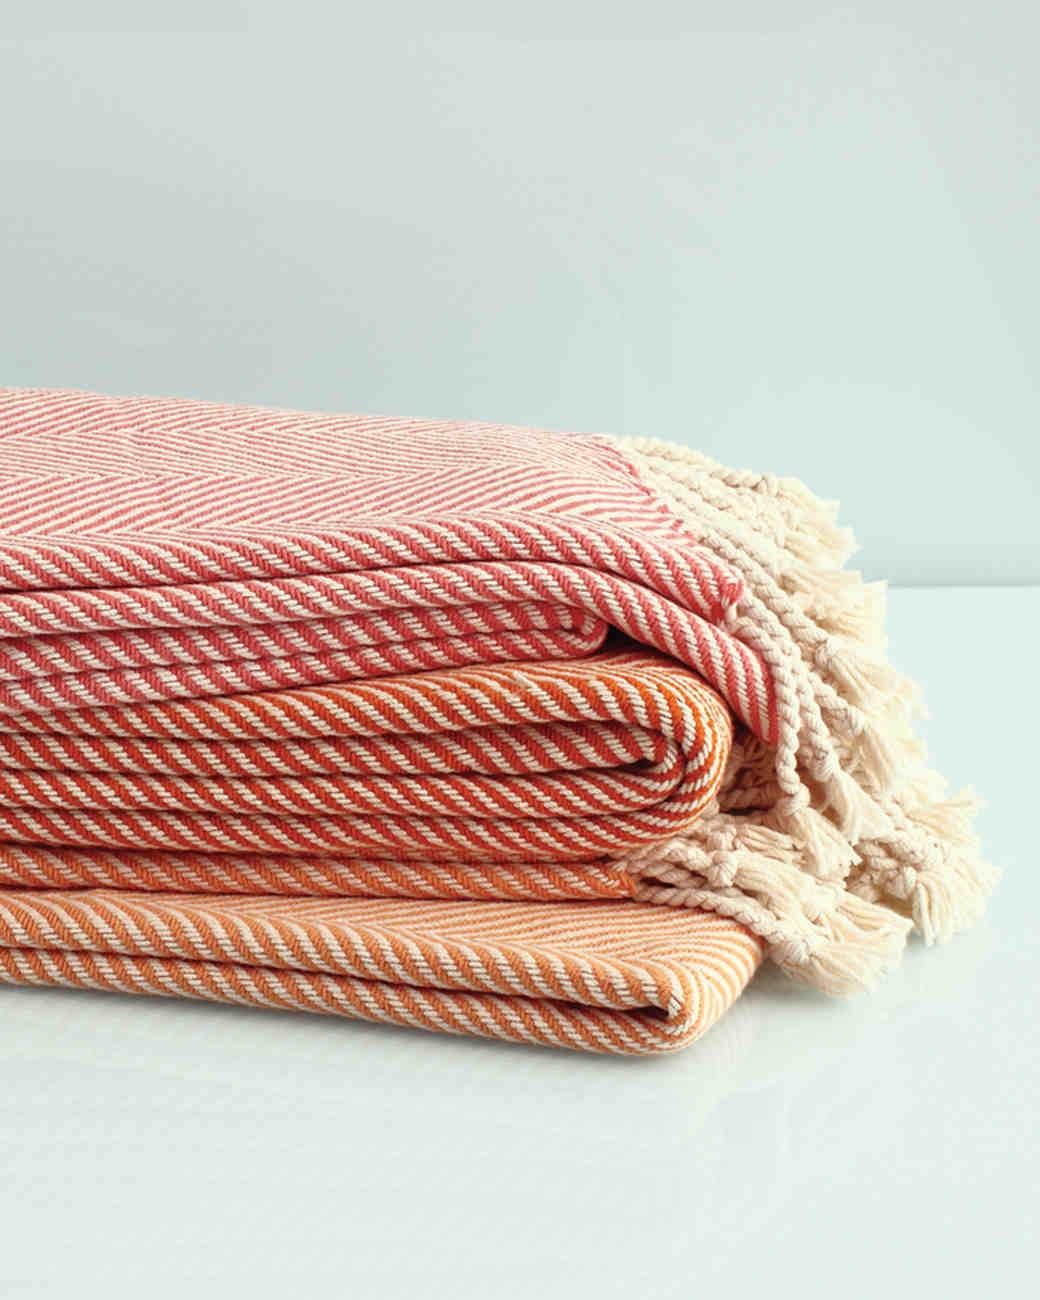 blankets-mwd108267.jpg